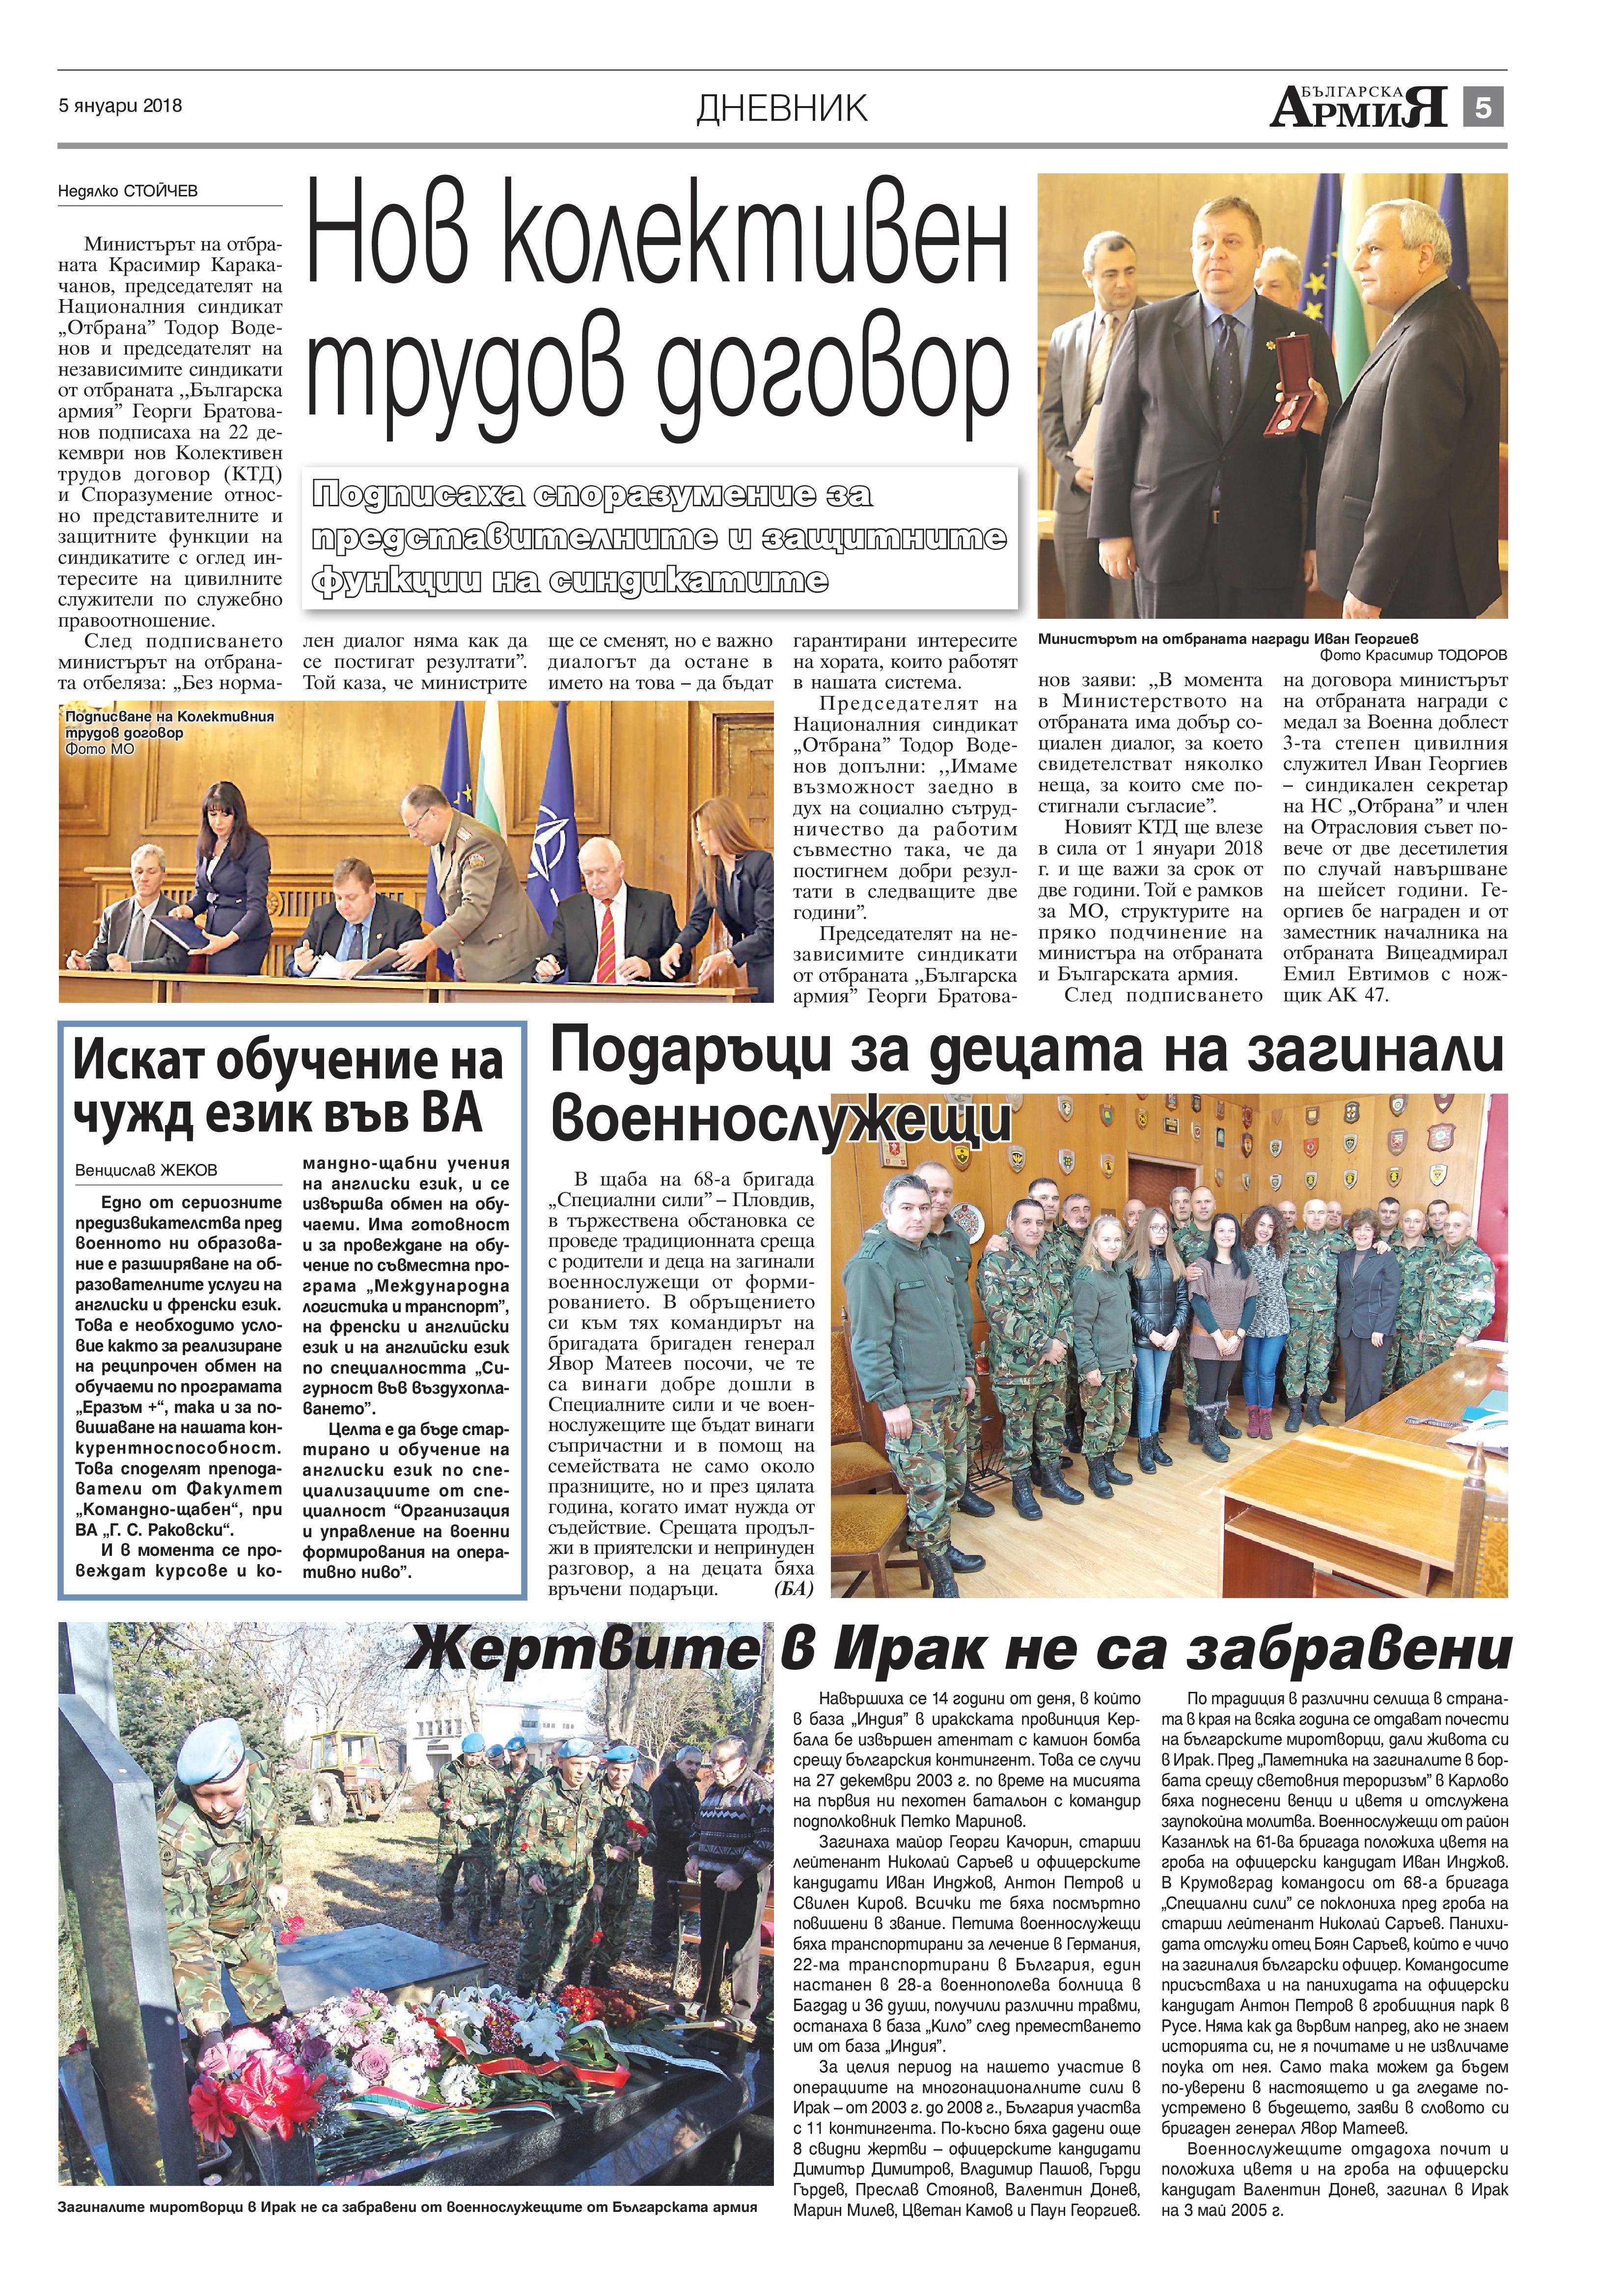 http://armymedia.bg/wp-content/uploads/2018/01/05.jpg